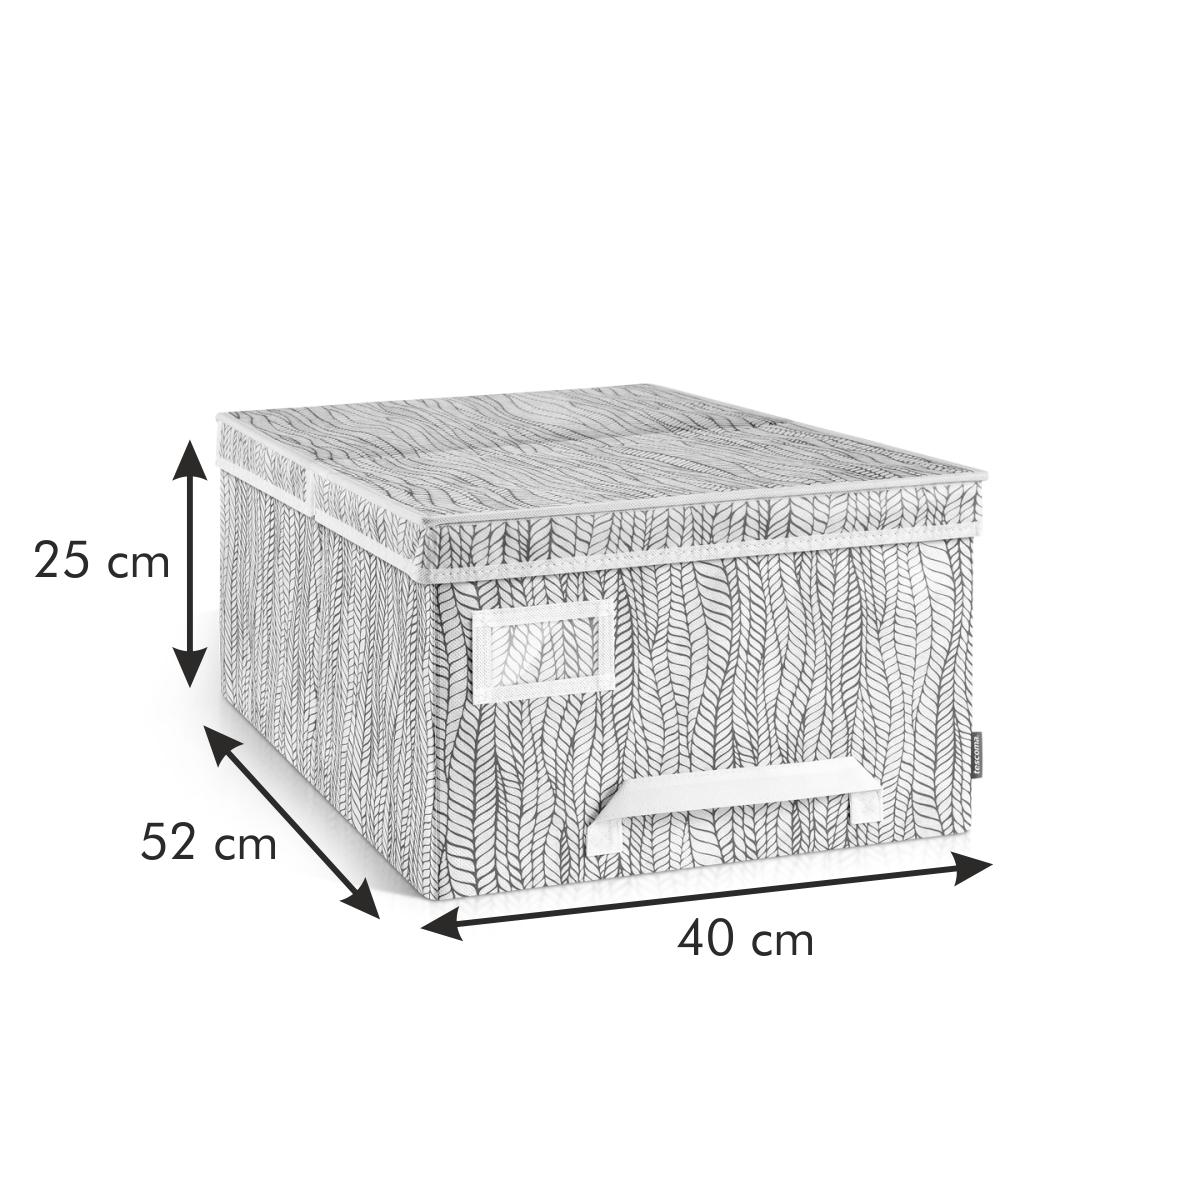 Krabice na oděvy FANCY HOME 40 x 52 x 25 cm